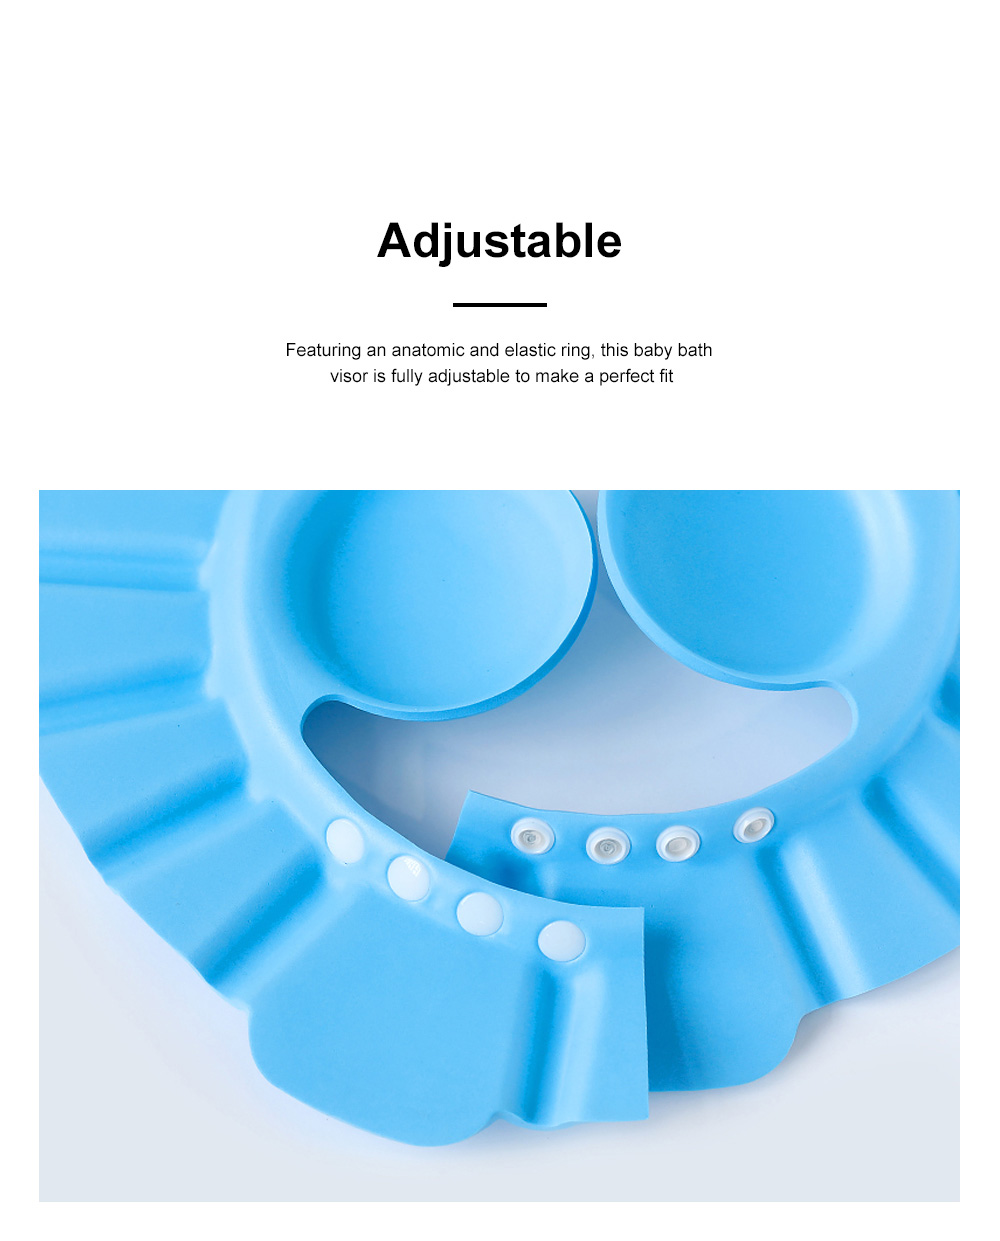 Adjustable Baby Bath Visor Cap Waterproof & Elastic Ring Hat for Shower, Bathtub, Sun Bathing, Hair Cutting 2